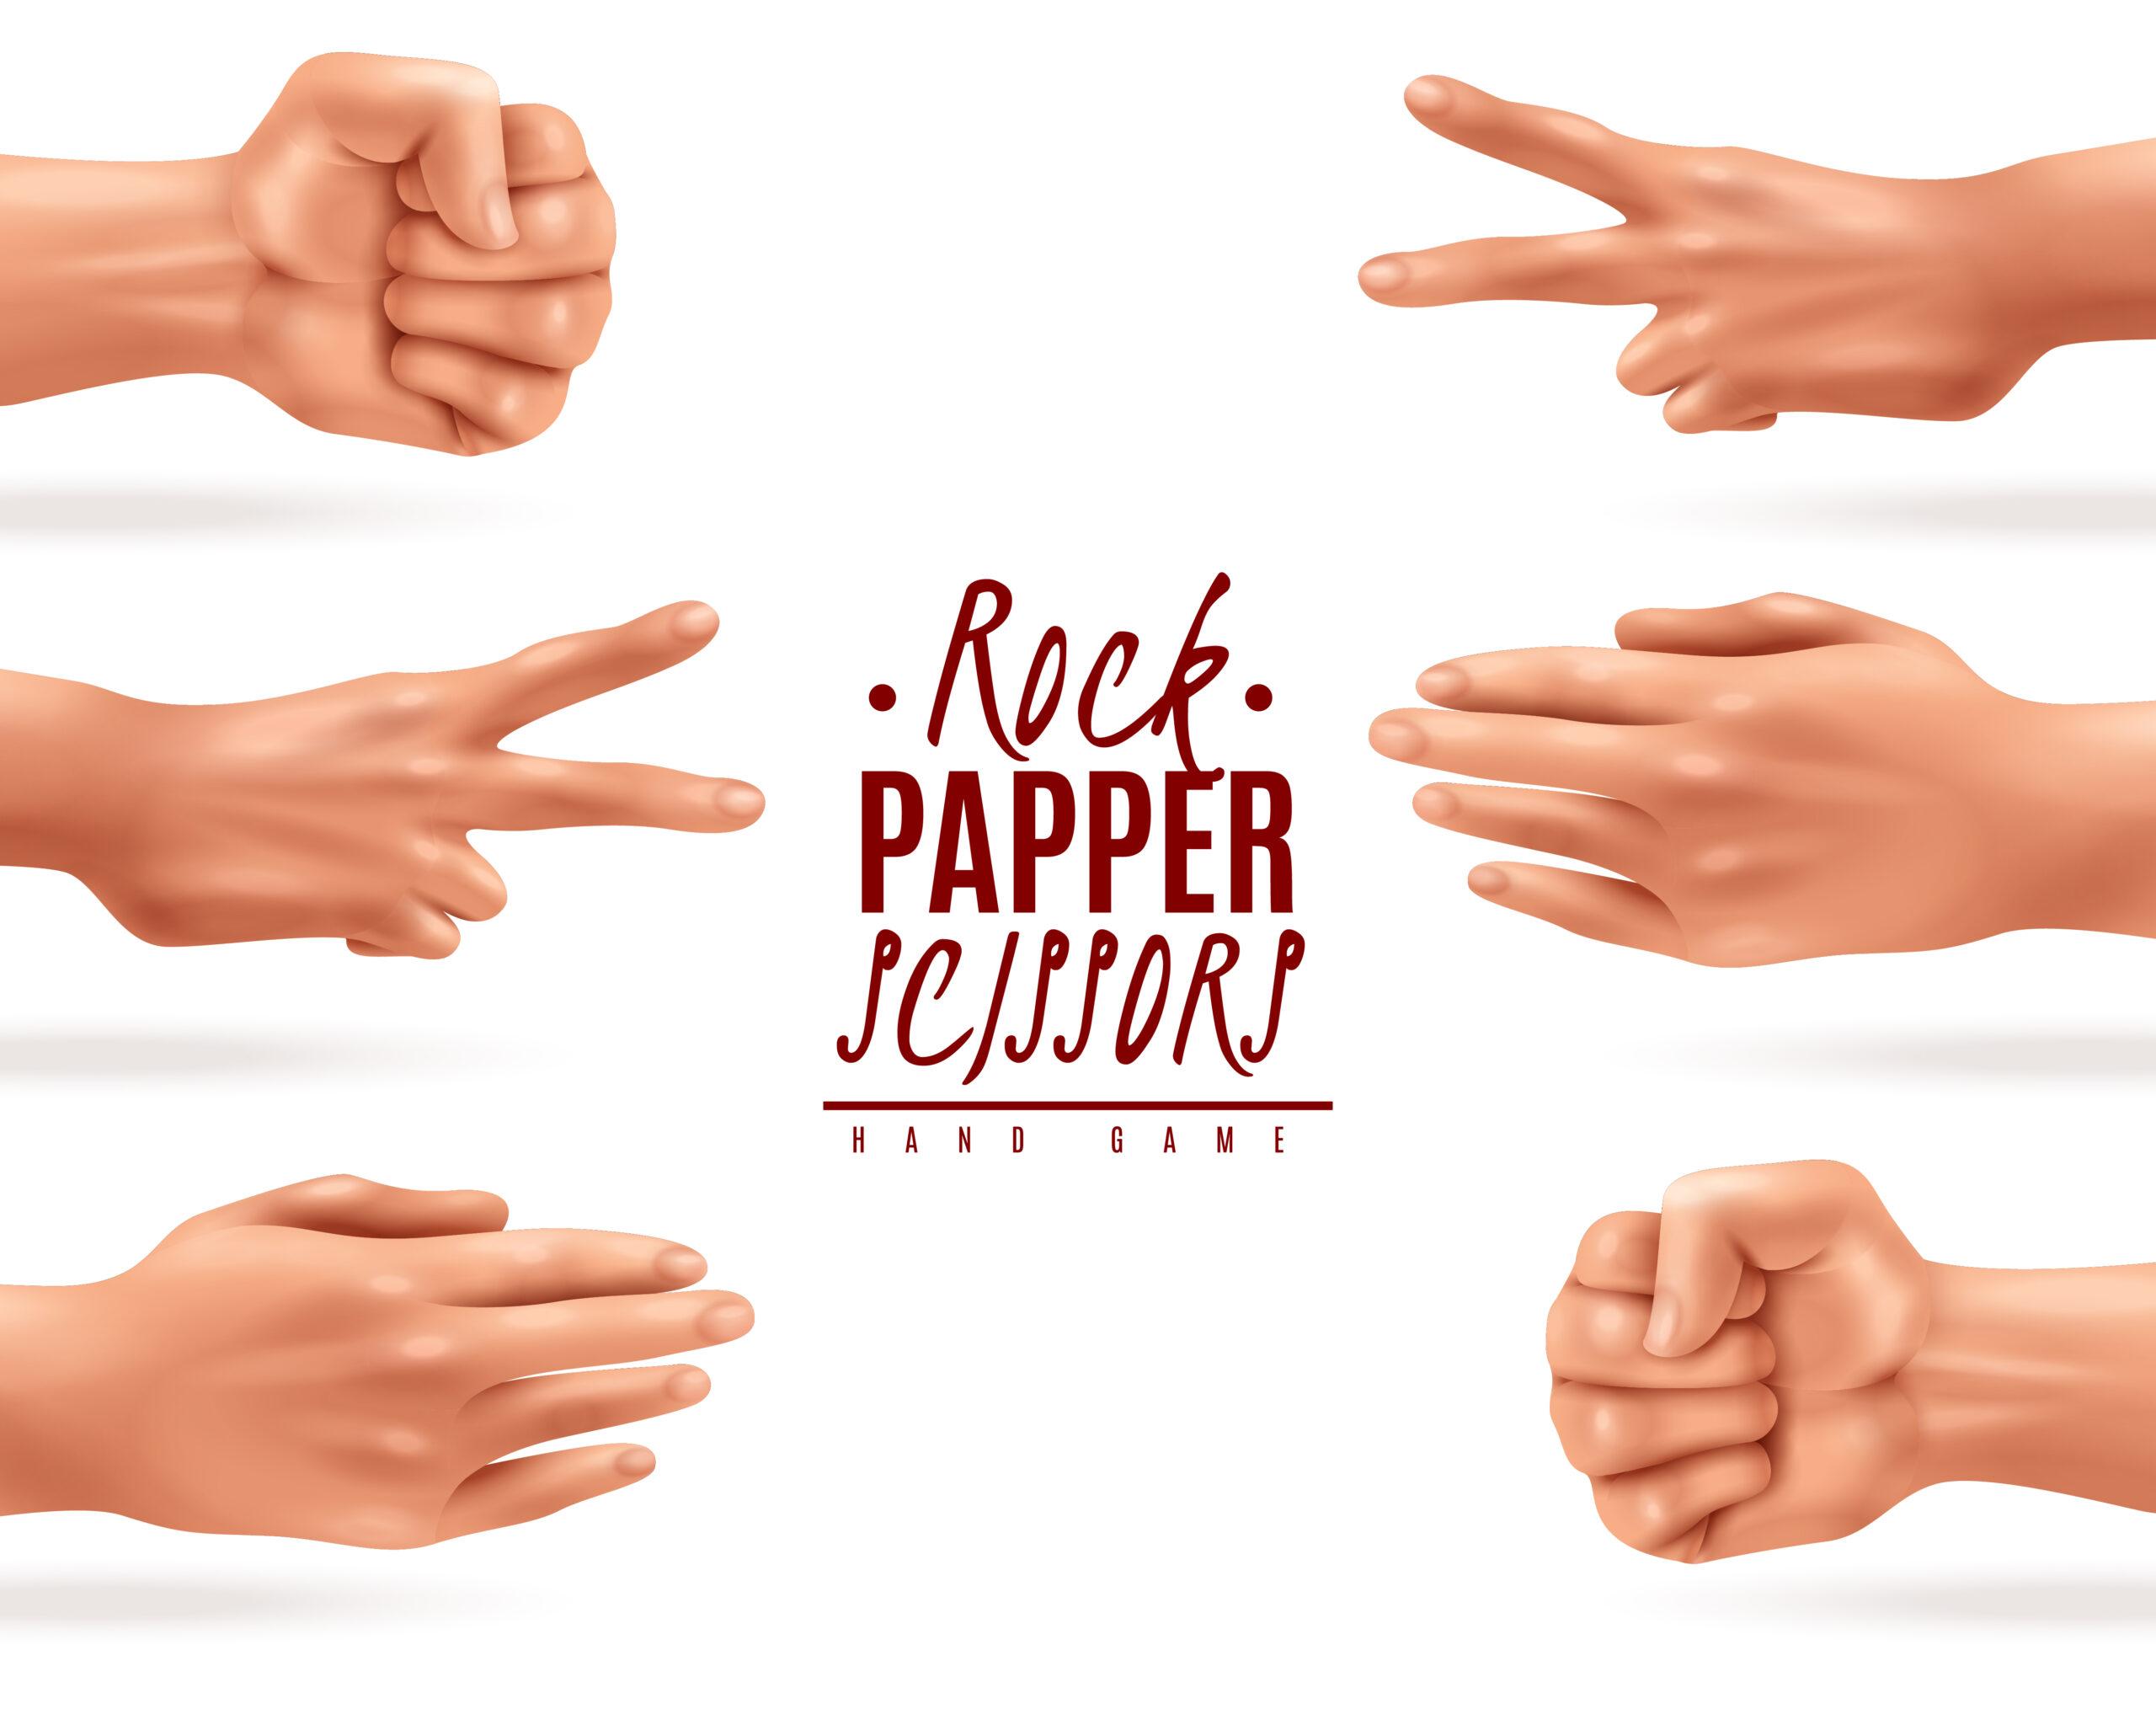 ROCK, PAPER, SCISSORS - Piedra, papel o tijera